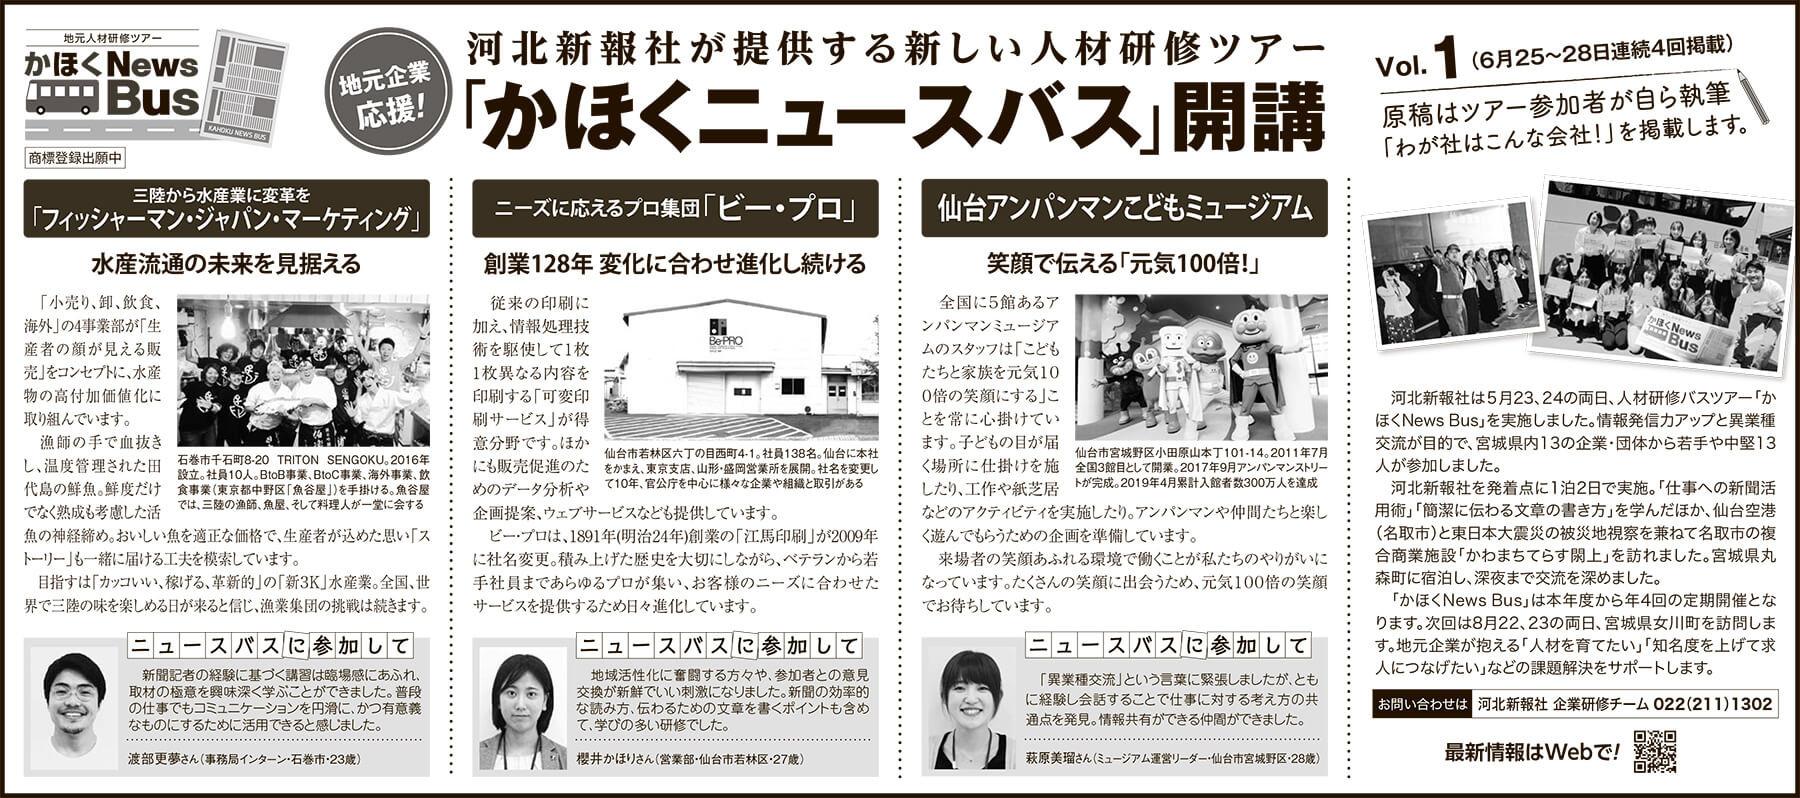 2019News_Bus_5d_総合-1.jpg